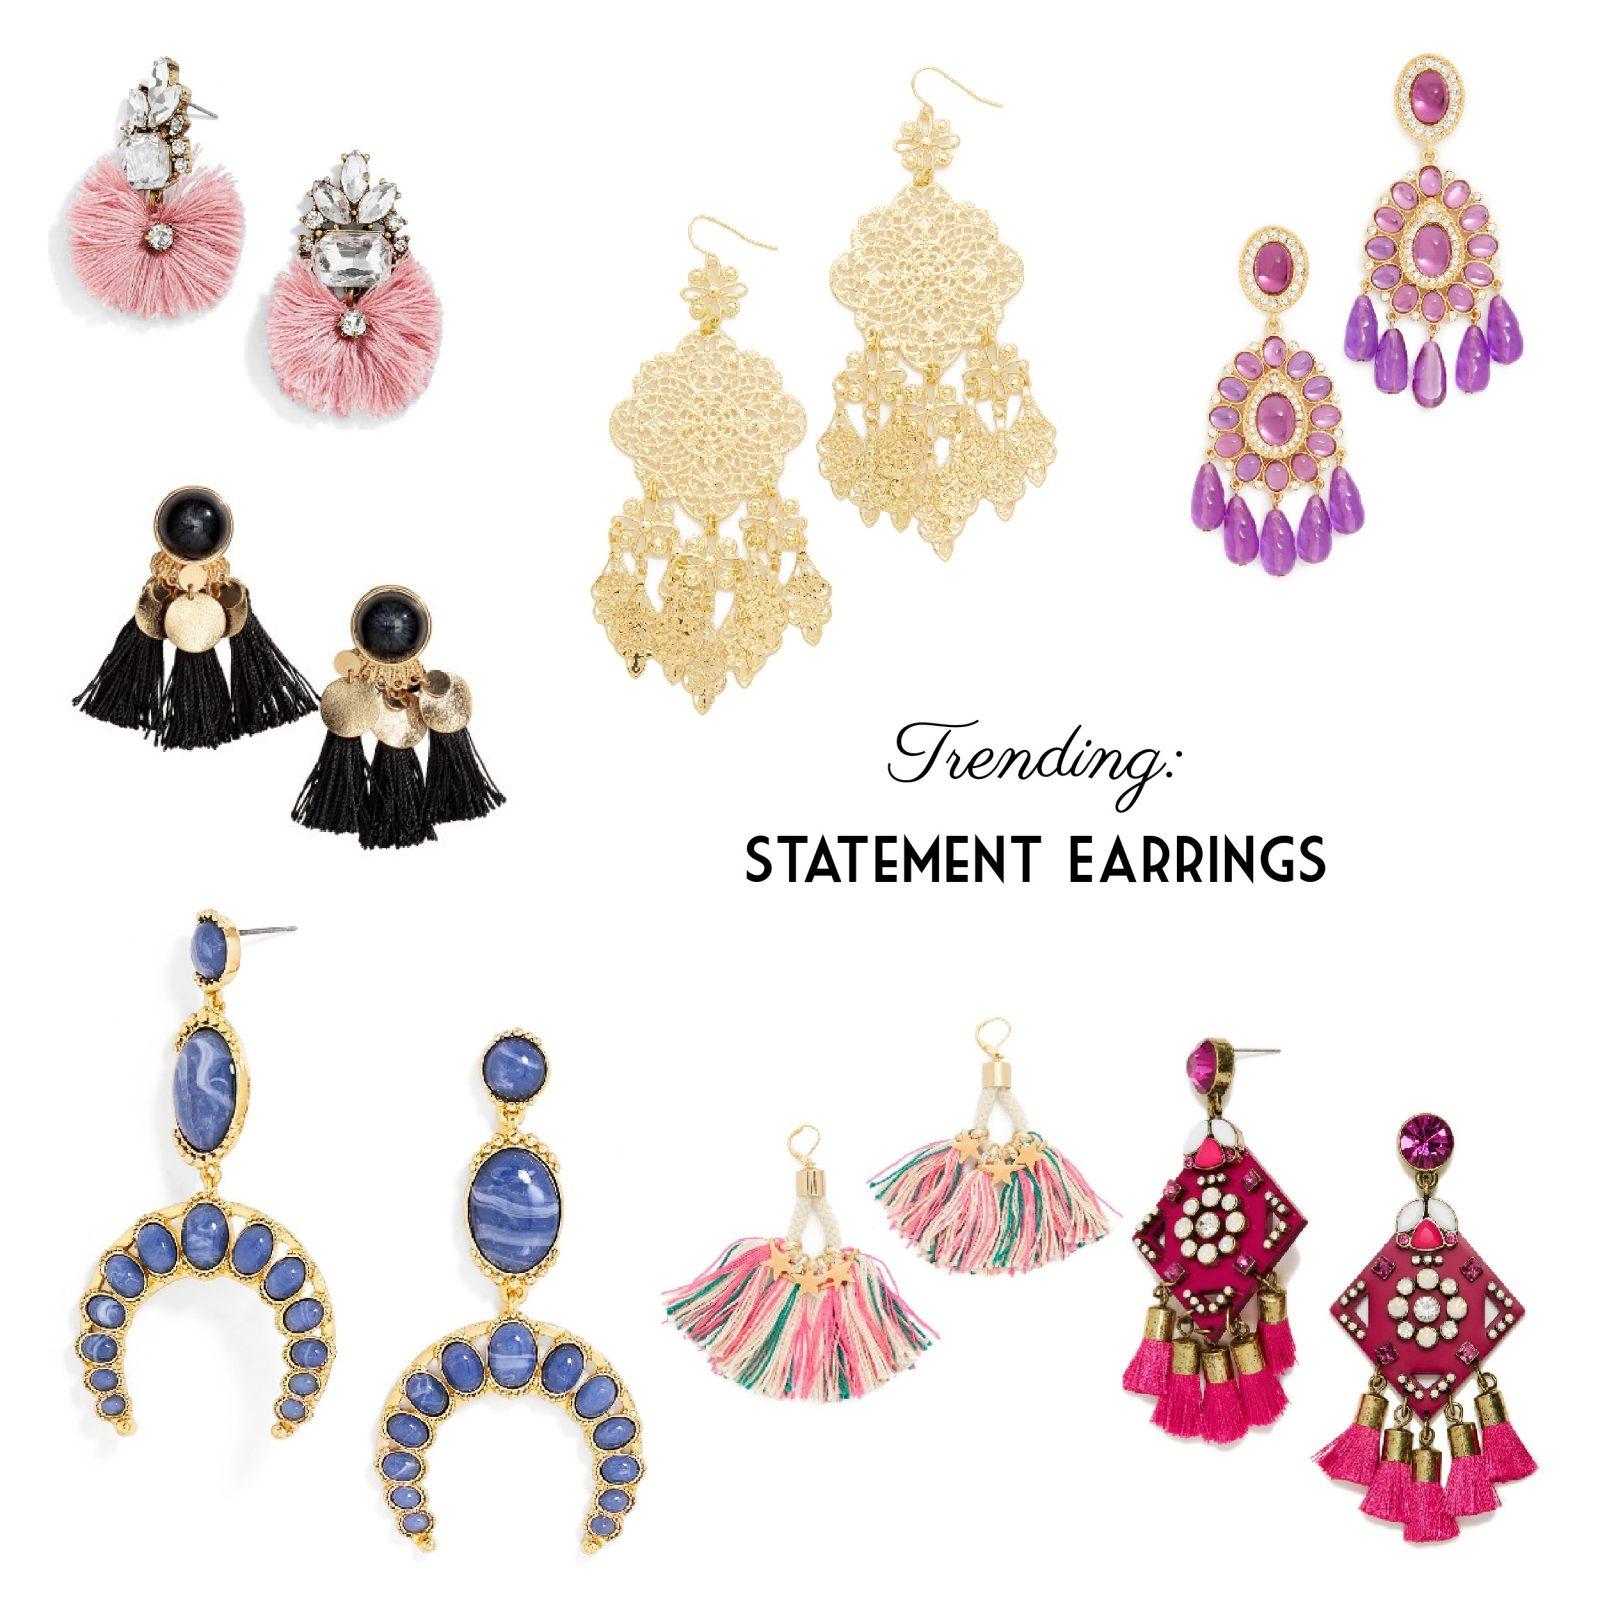 Trending Statement Earrings